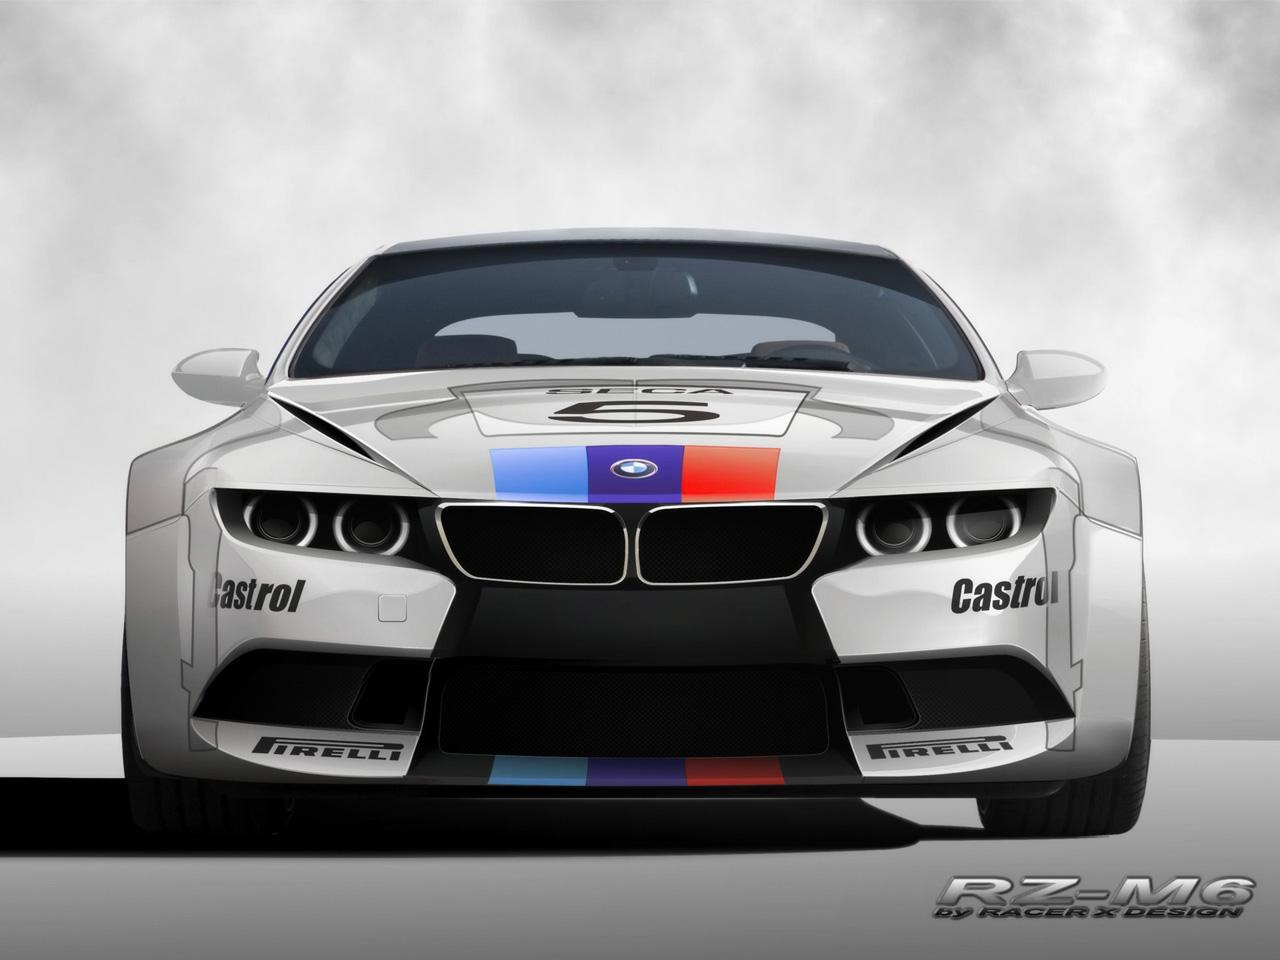 bmw sports car wallpaper hd bmw car wallpaper hd bmw